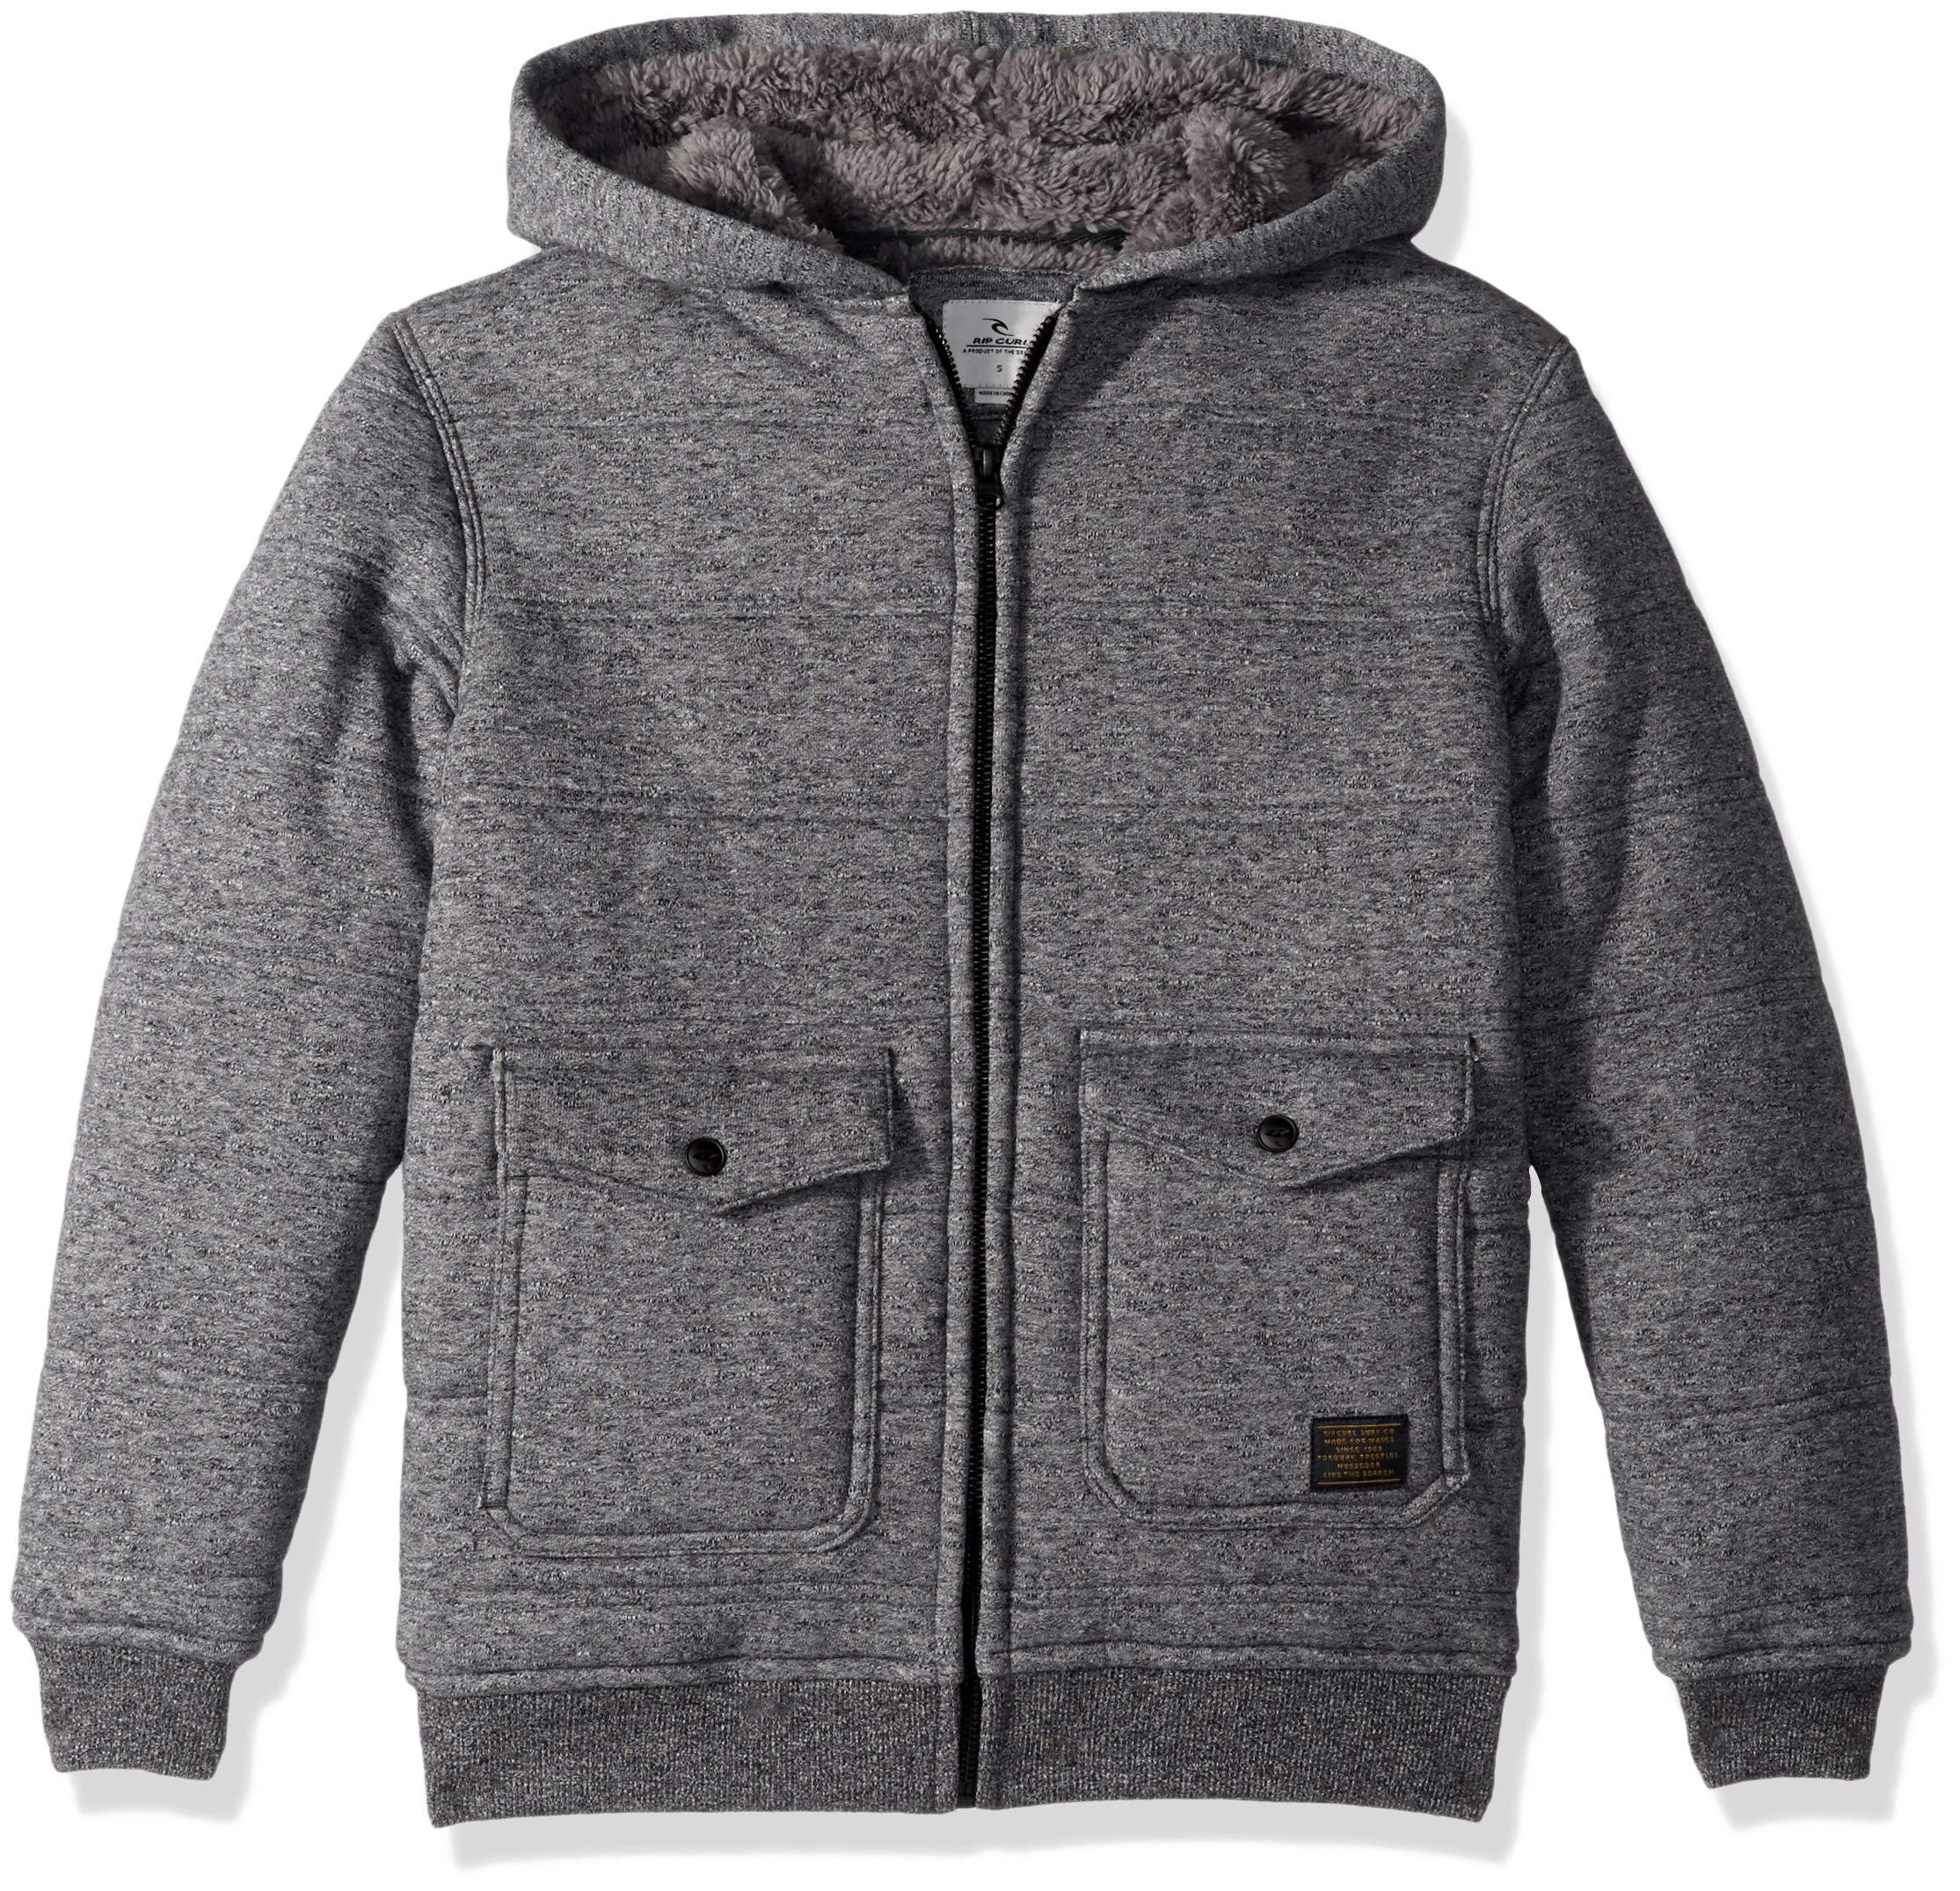 Rip Curl Boys' Big' Destination Sherpa Fleece, Black, S